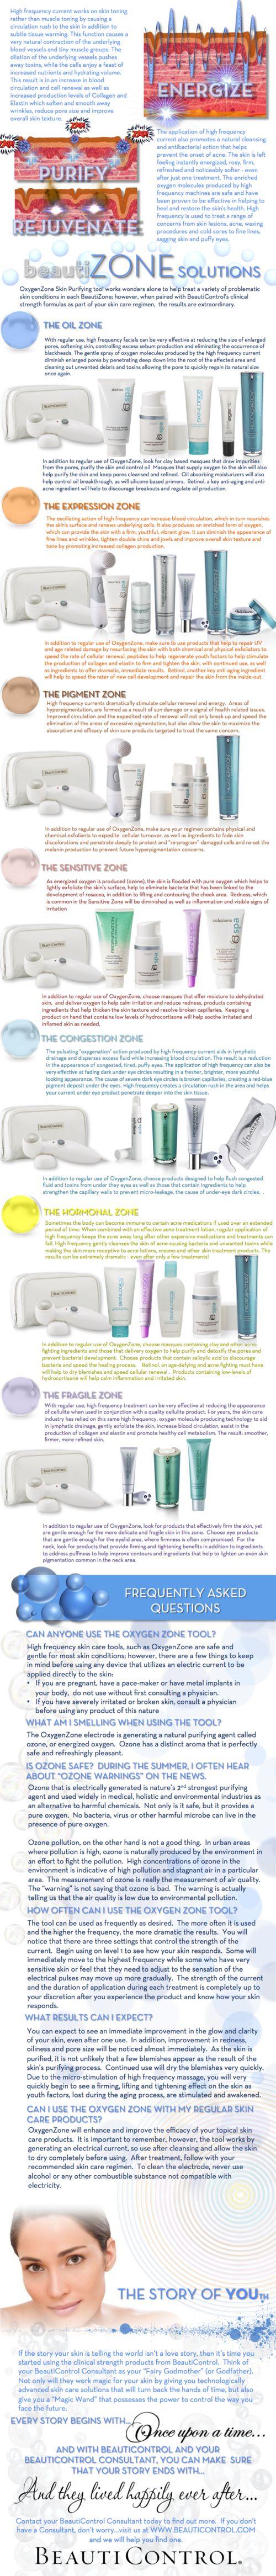 BeautiZone Infograph page2 PNG